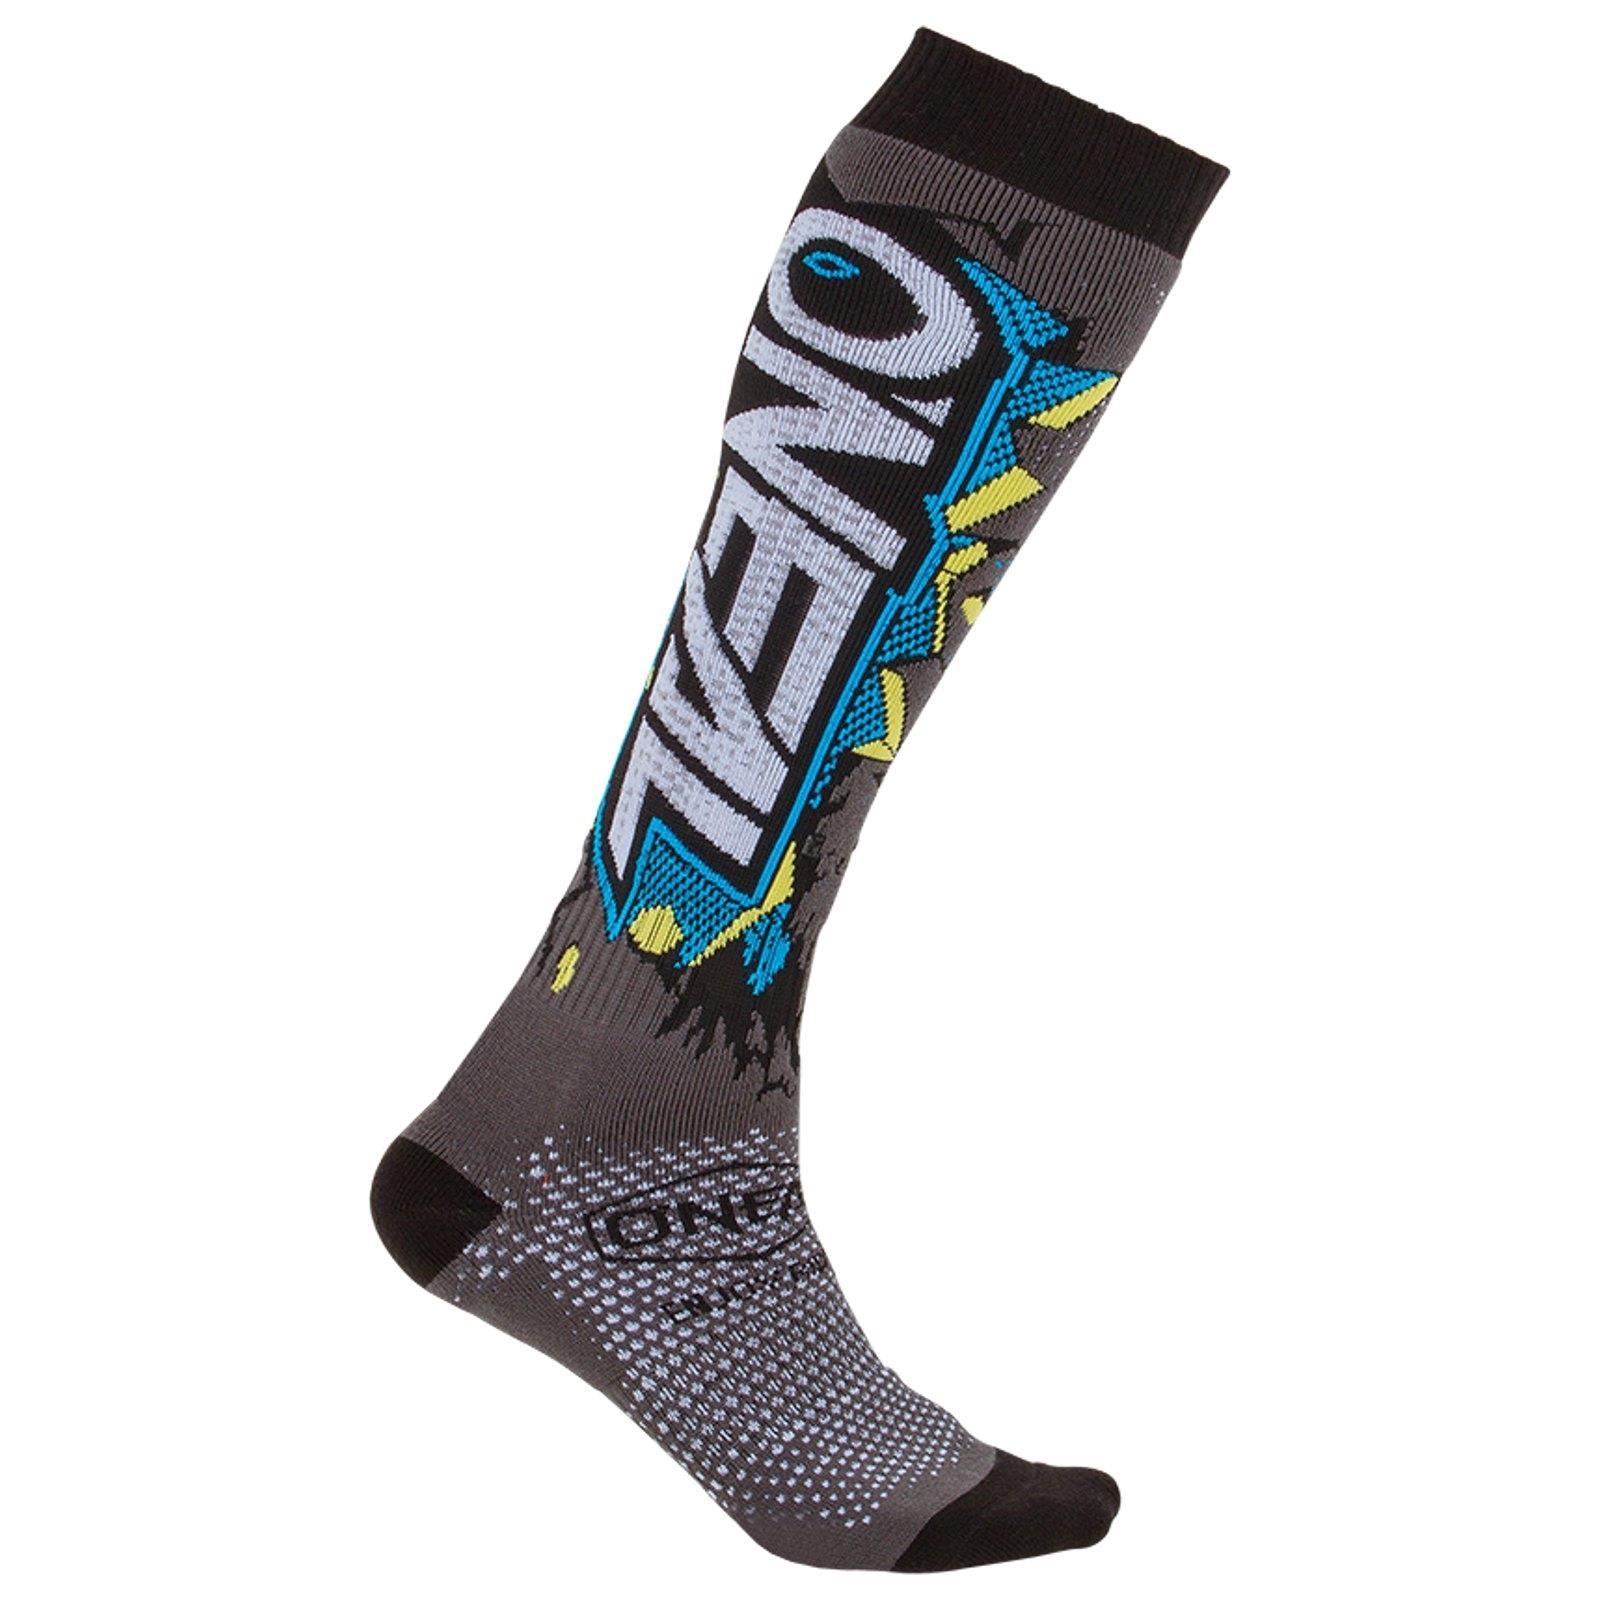 ONEAL-MOTO-CROSS-Calze-Moto-Enduro-MX-MTB-ATV-Quad-Calze-Sock-BICICLETTA-FR miniatura 16